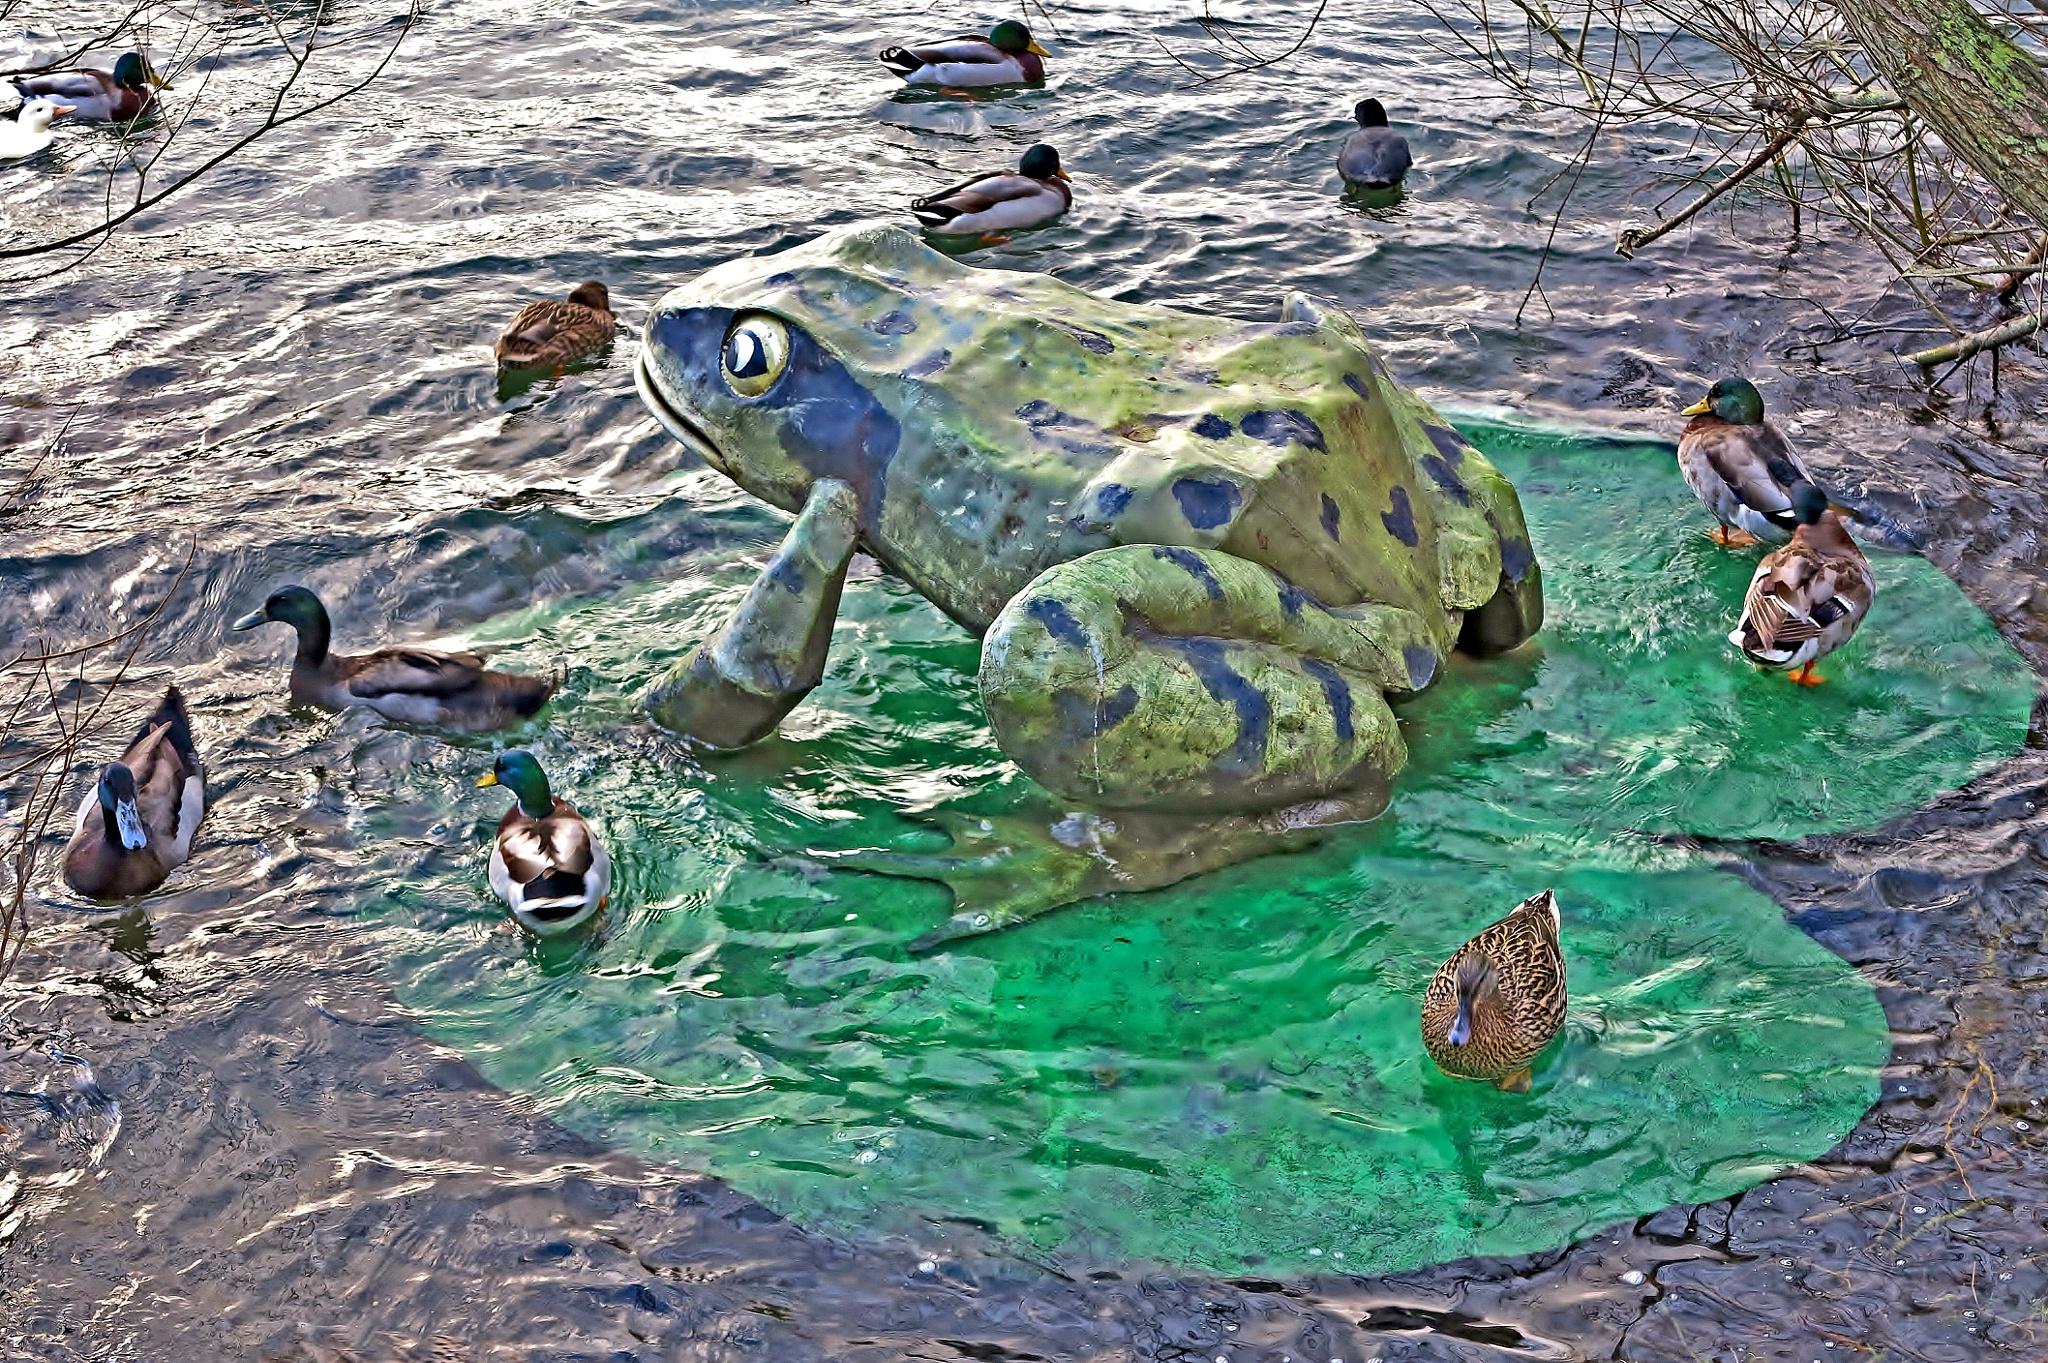 Frog & Ducks - Colour by paul.hosker